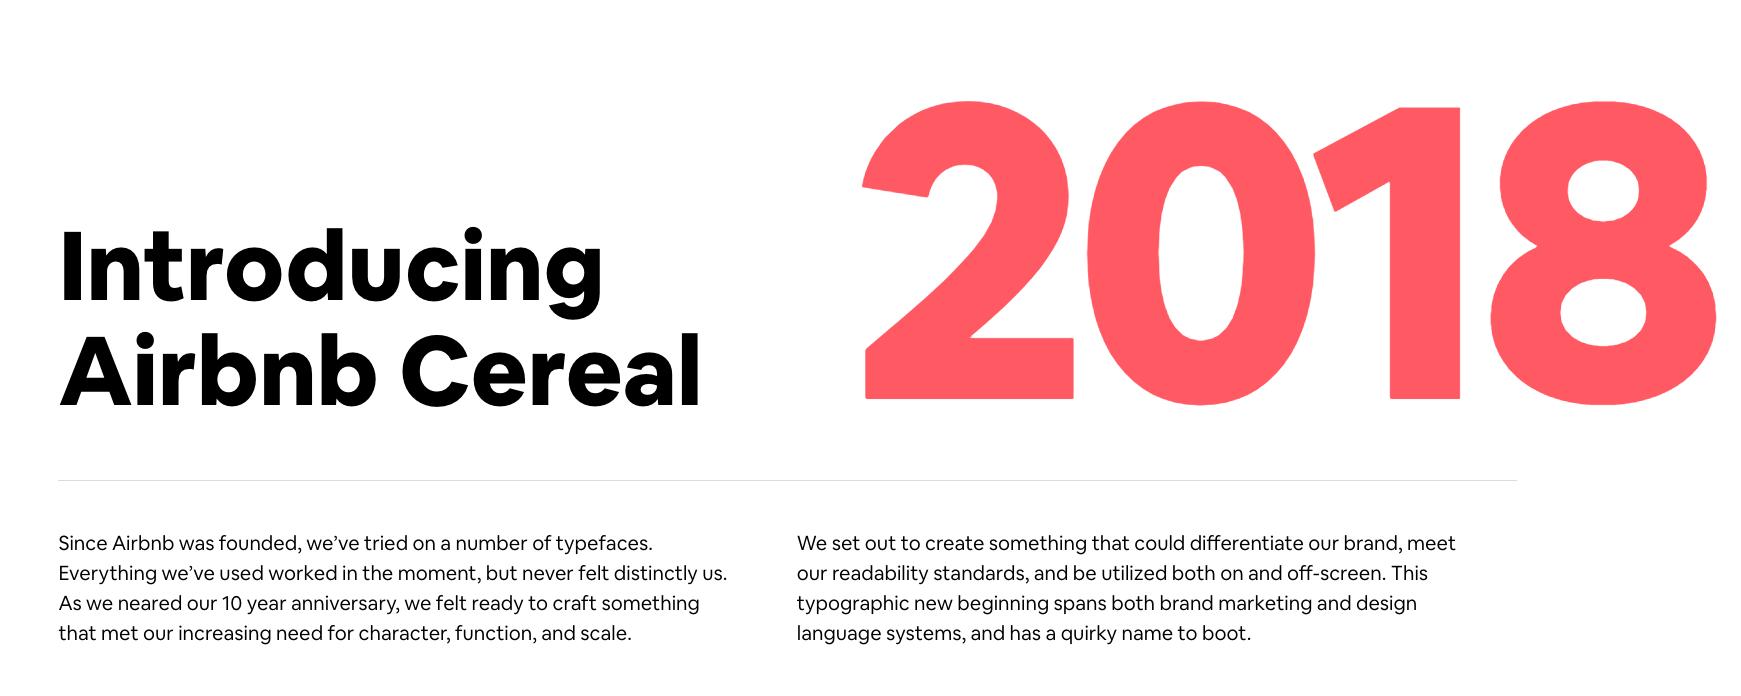 Airbnb Cereal, tipografia custom do Airbnb | Dalton Maag